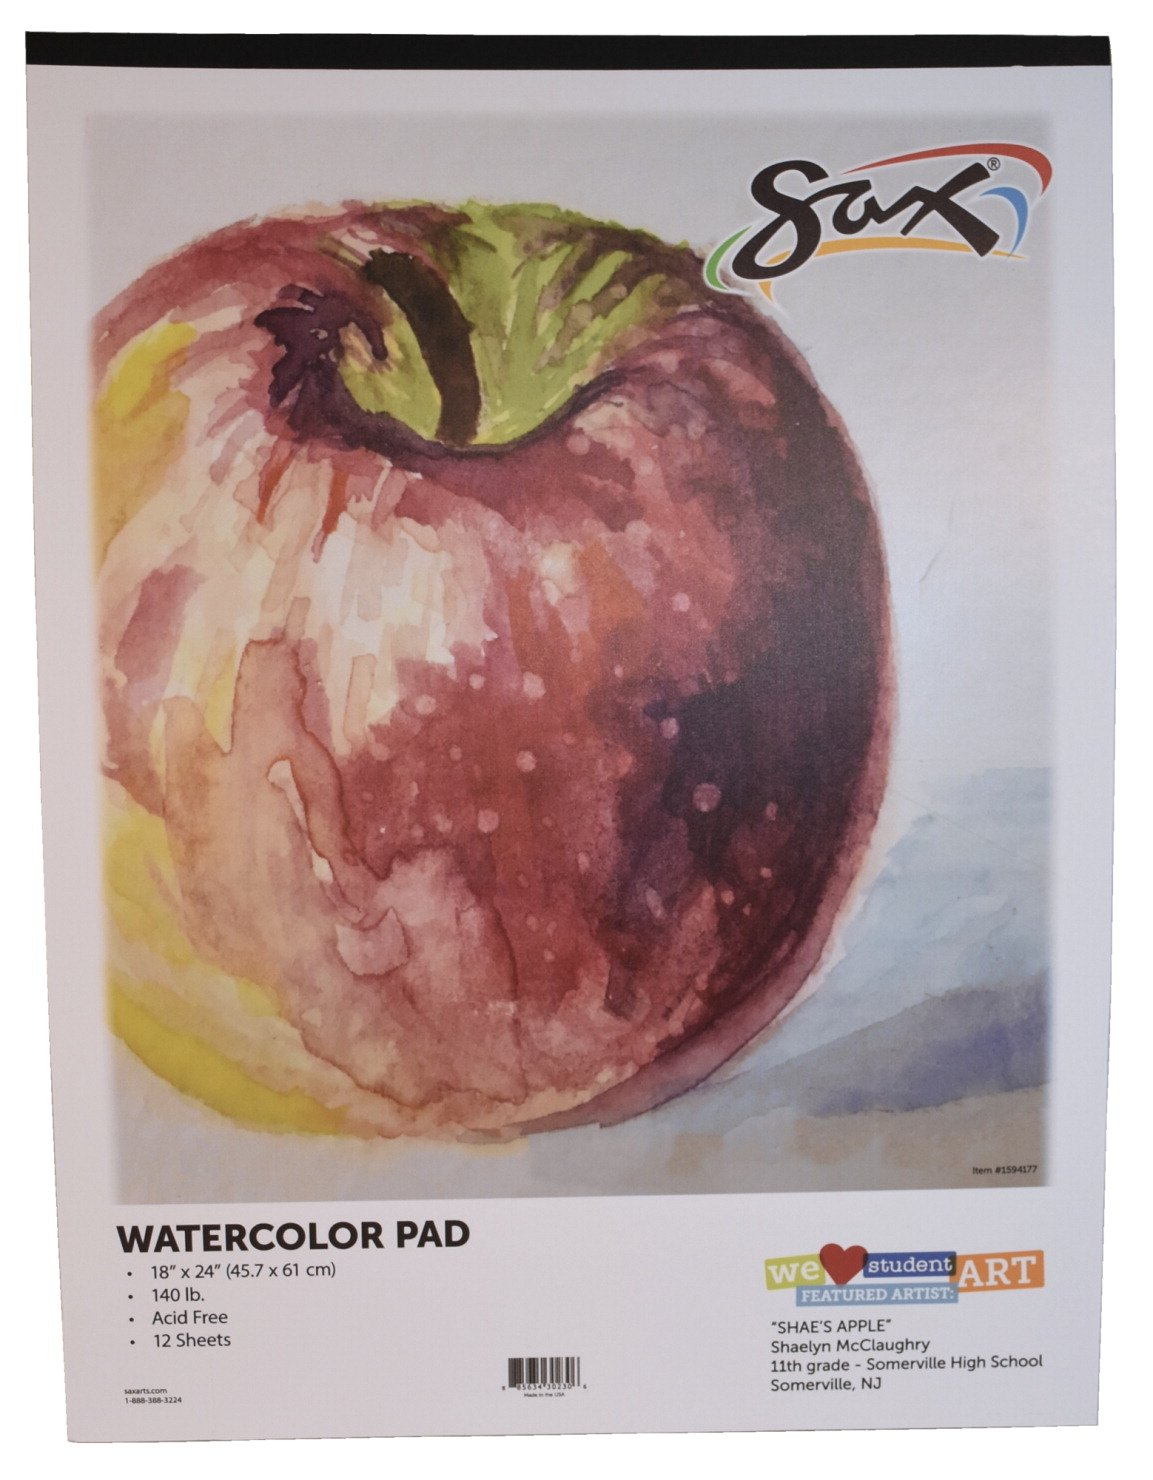 Sax Watercolor Pad White 18 x 24 Inches 140 lb 12 Sheets